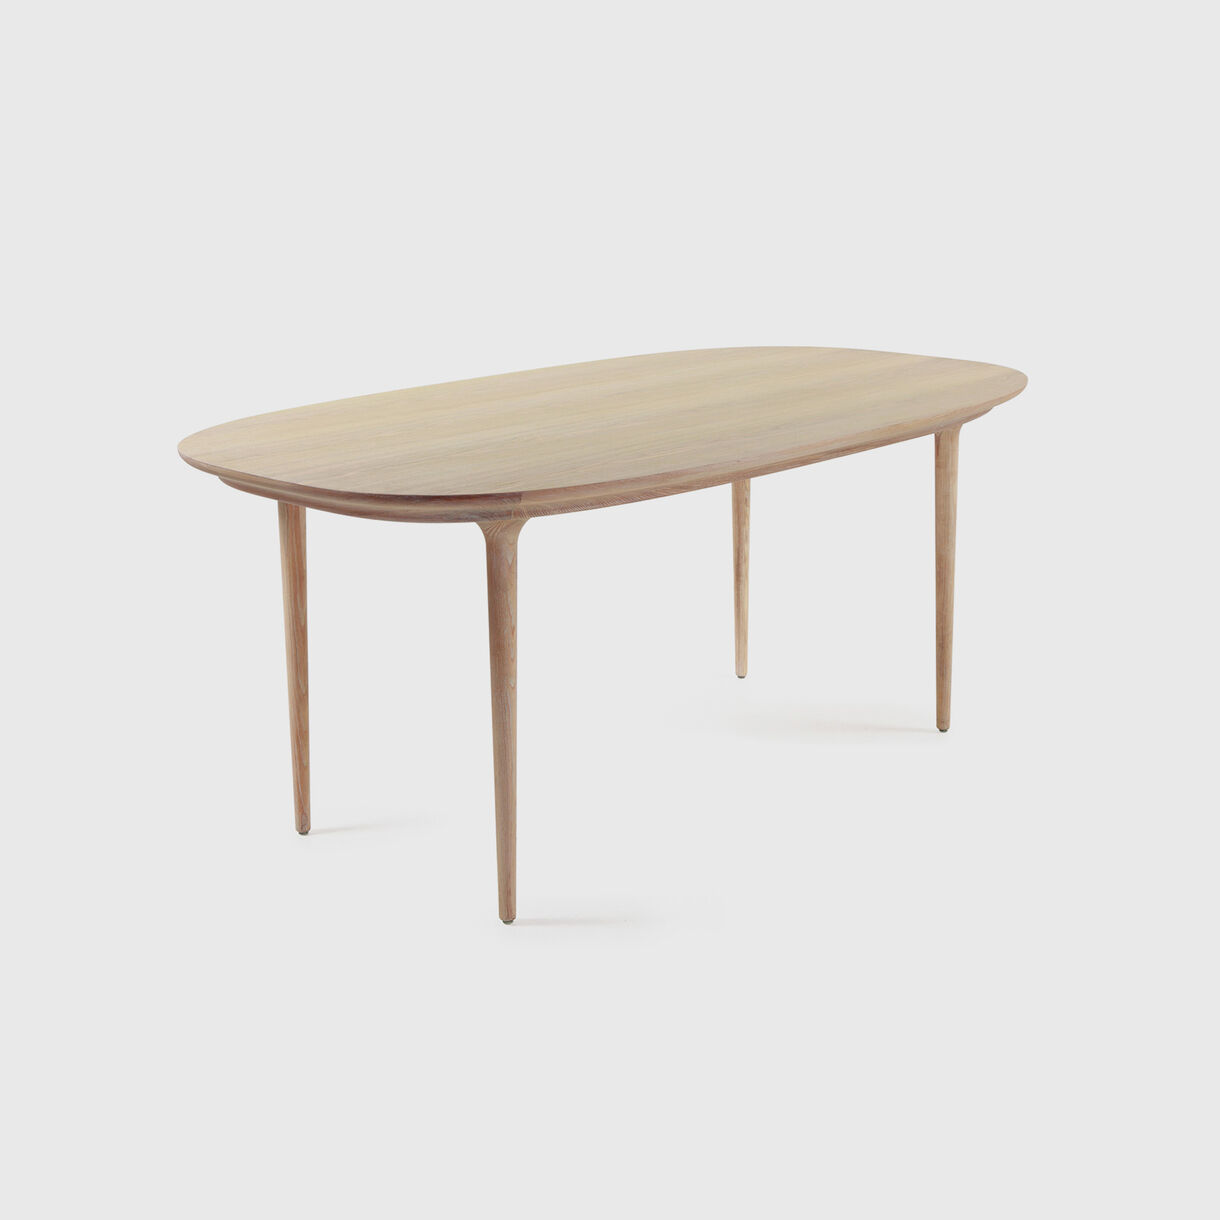 Lunar Dining Table